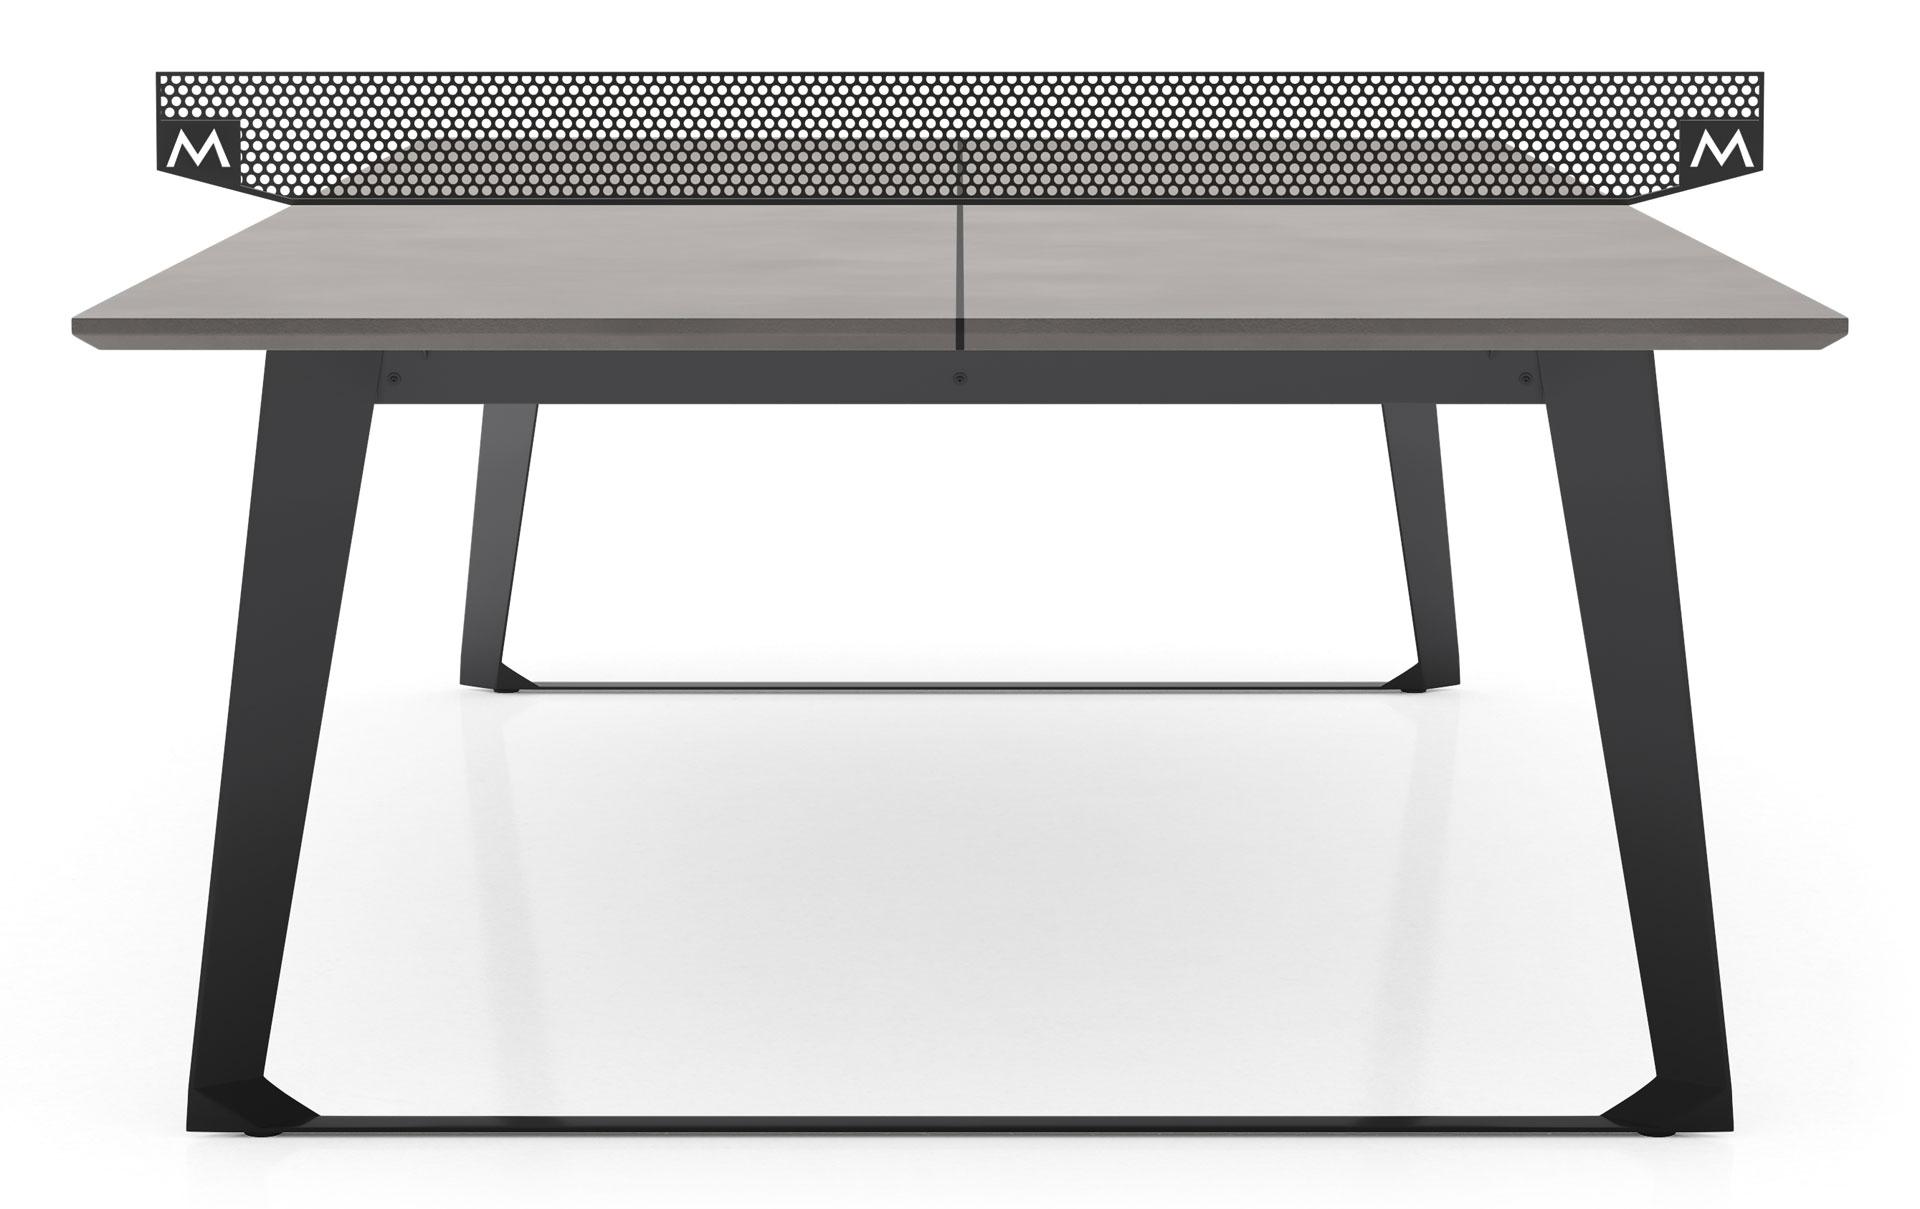 Amsterdam Ping Pong Table